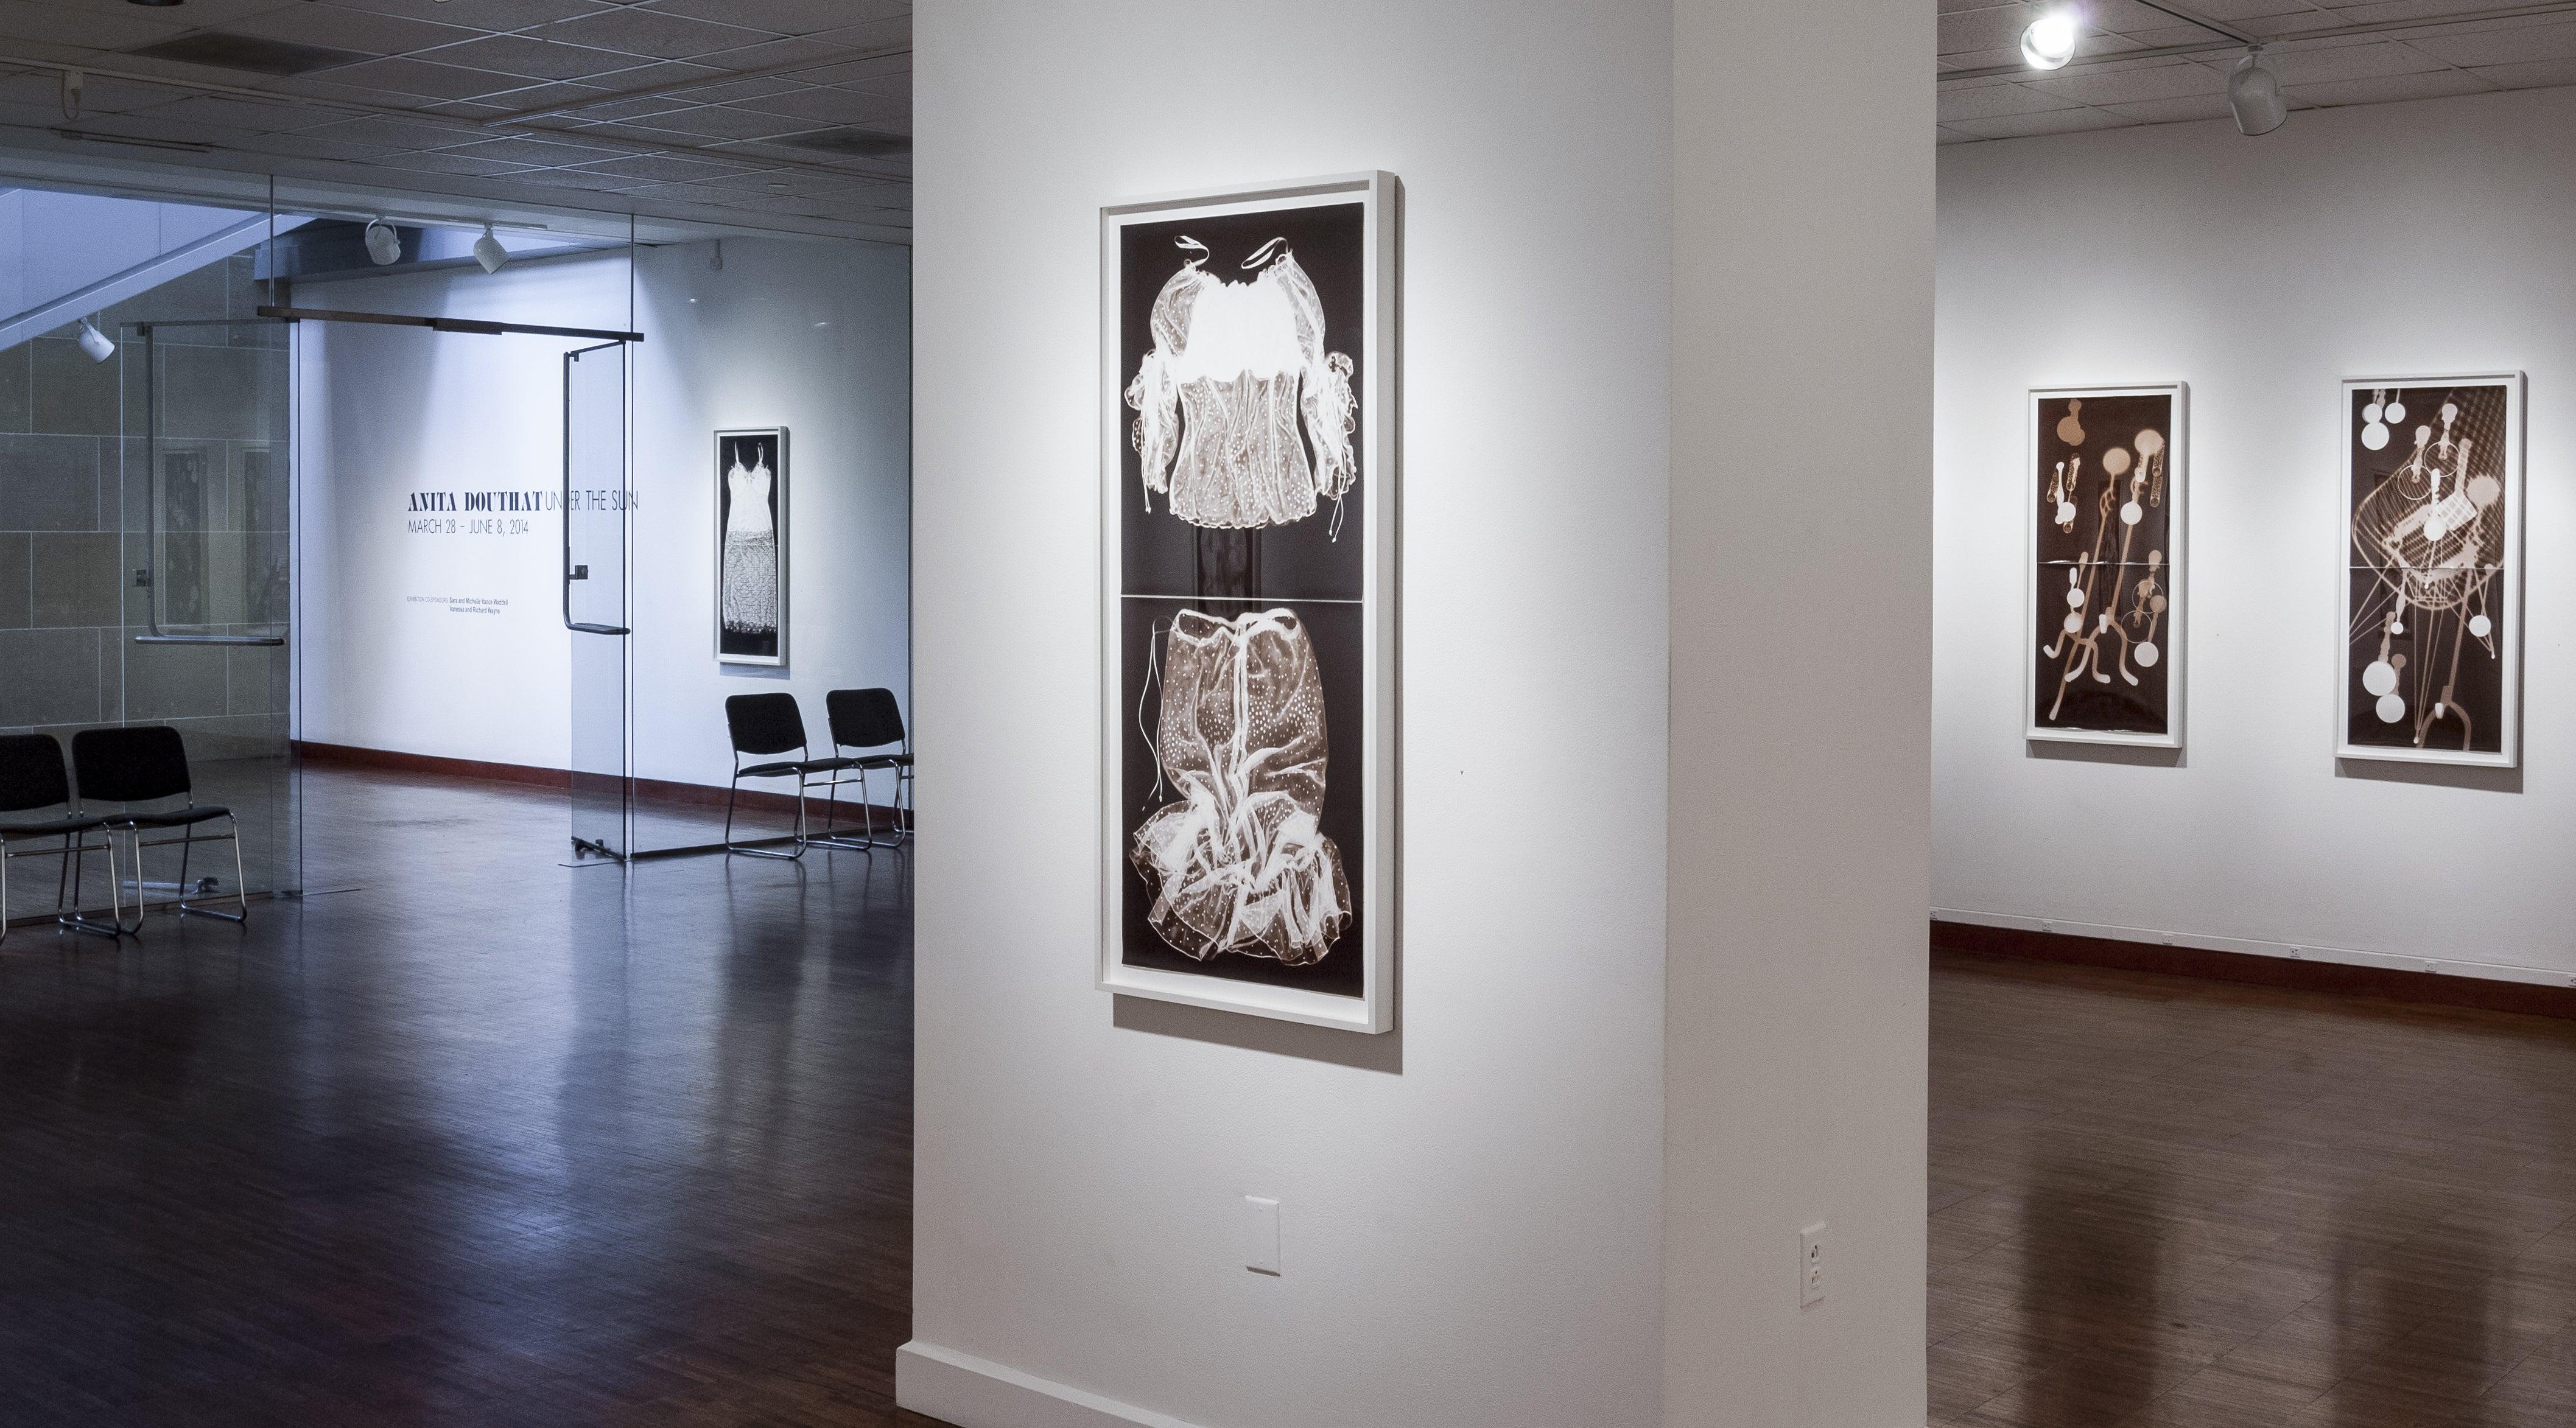 ... Anita   Transparent Uniforms X (Variation 2), 2007, Photograms, 48 X 20  Inches ...